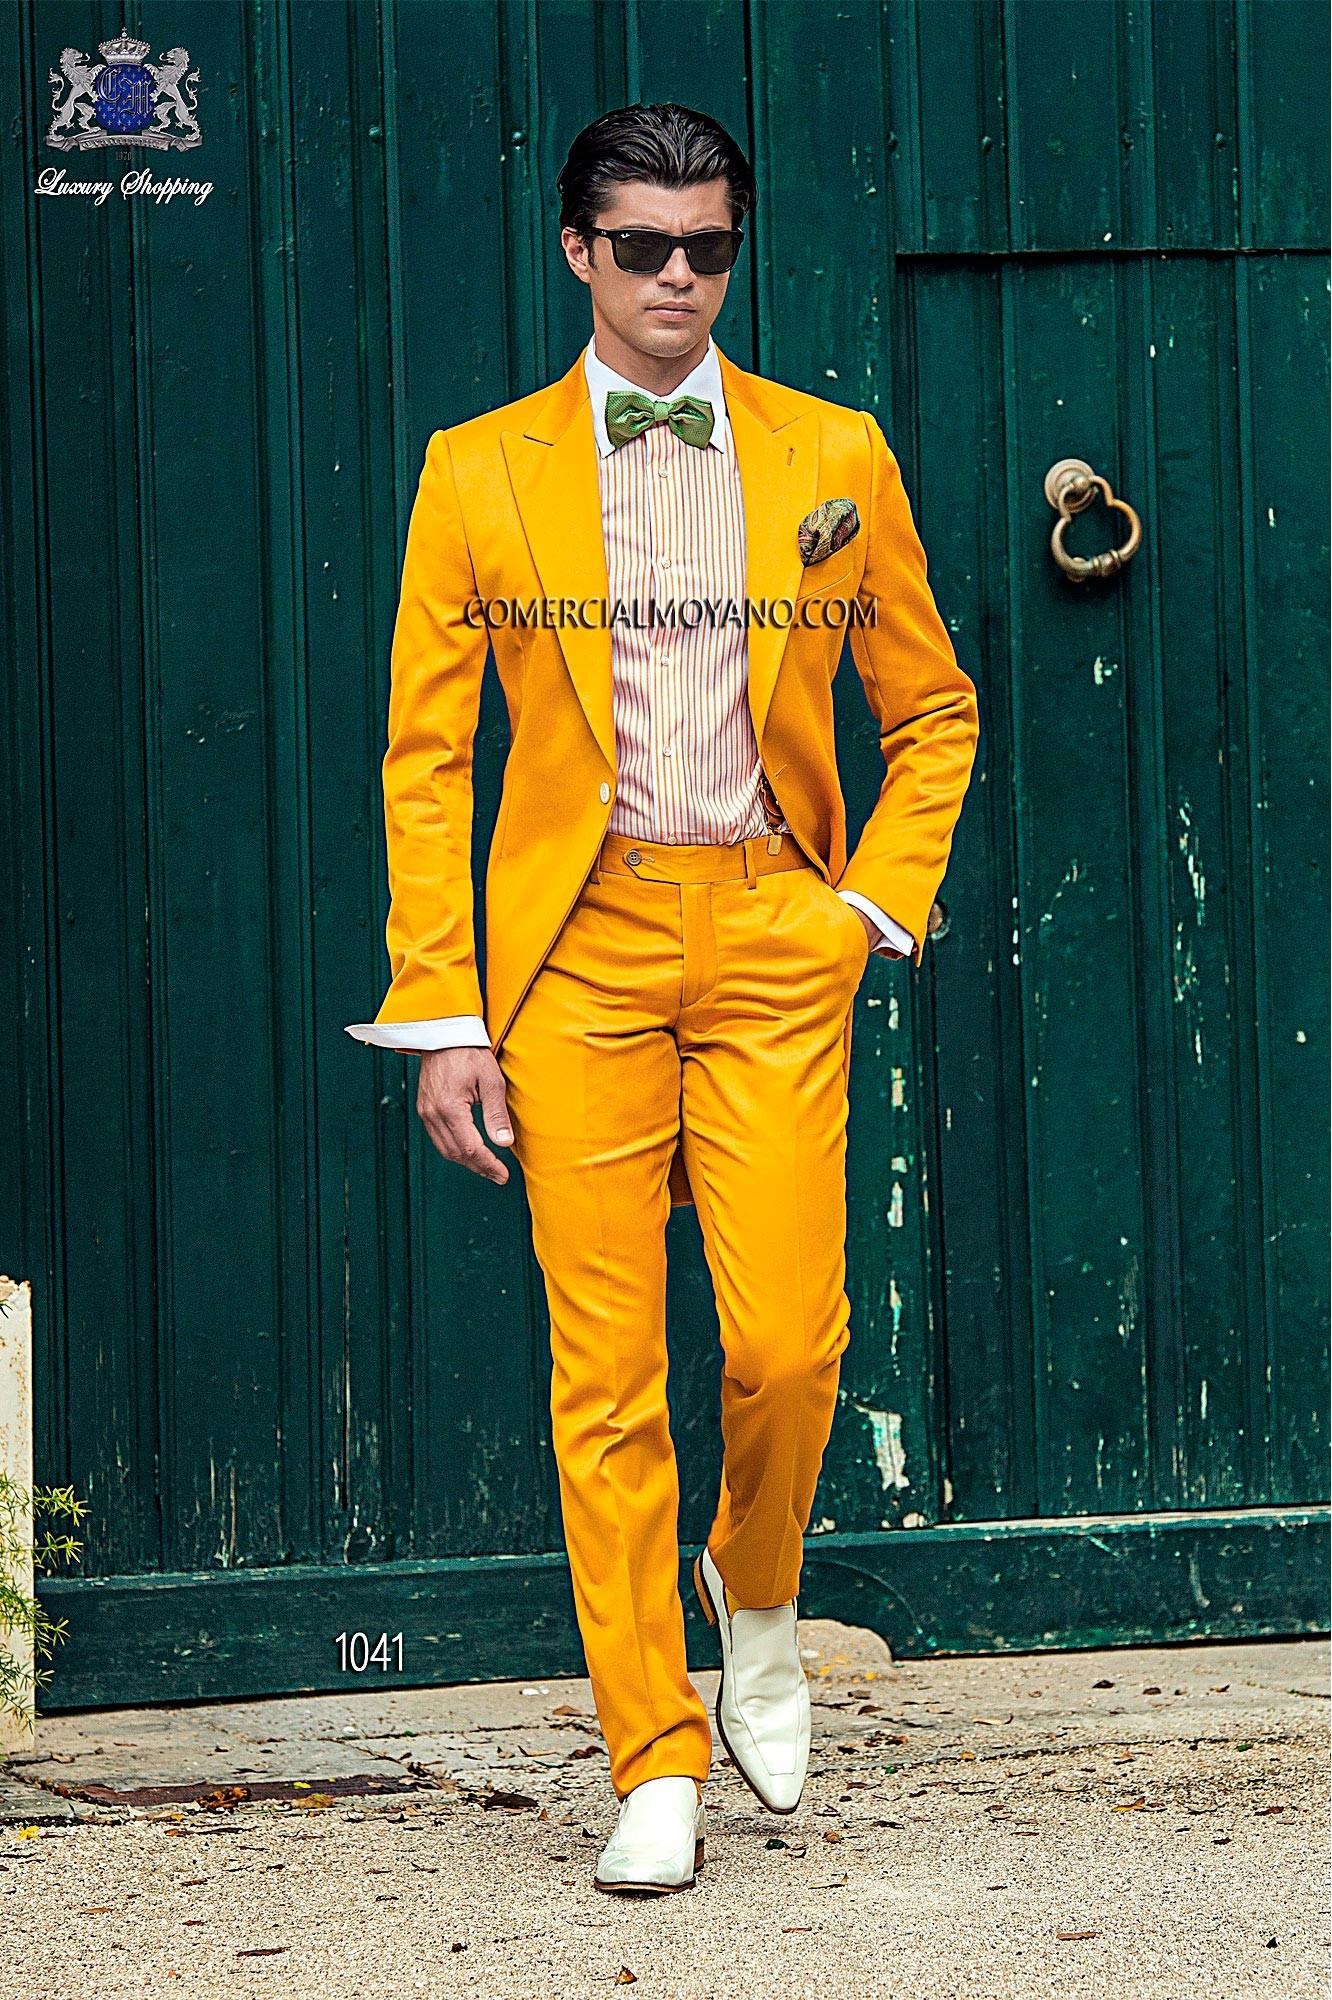 Hipster gold men wedding suit model 1041 Ottavio Nuccio Gala